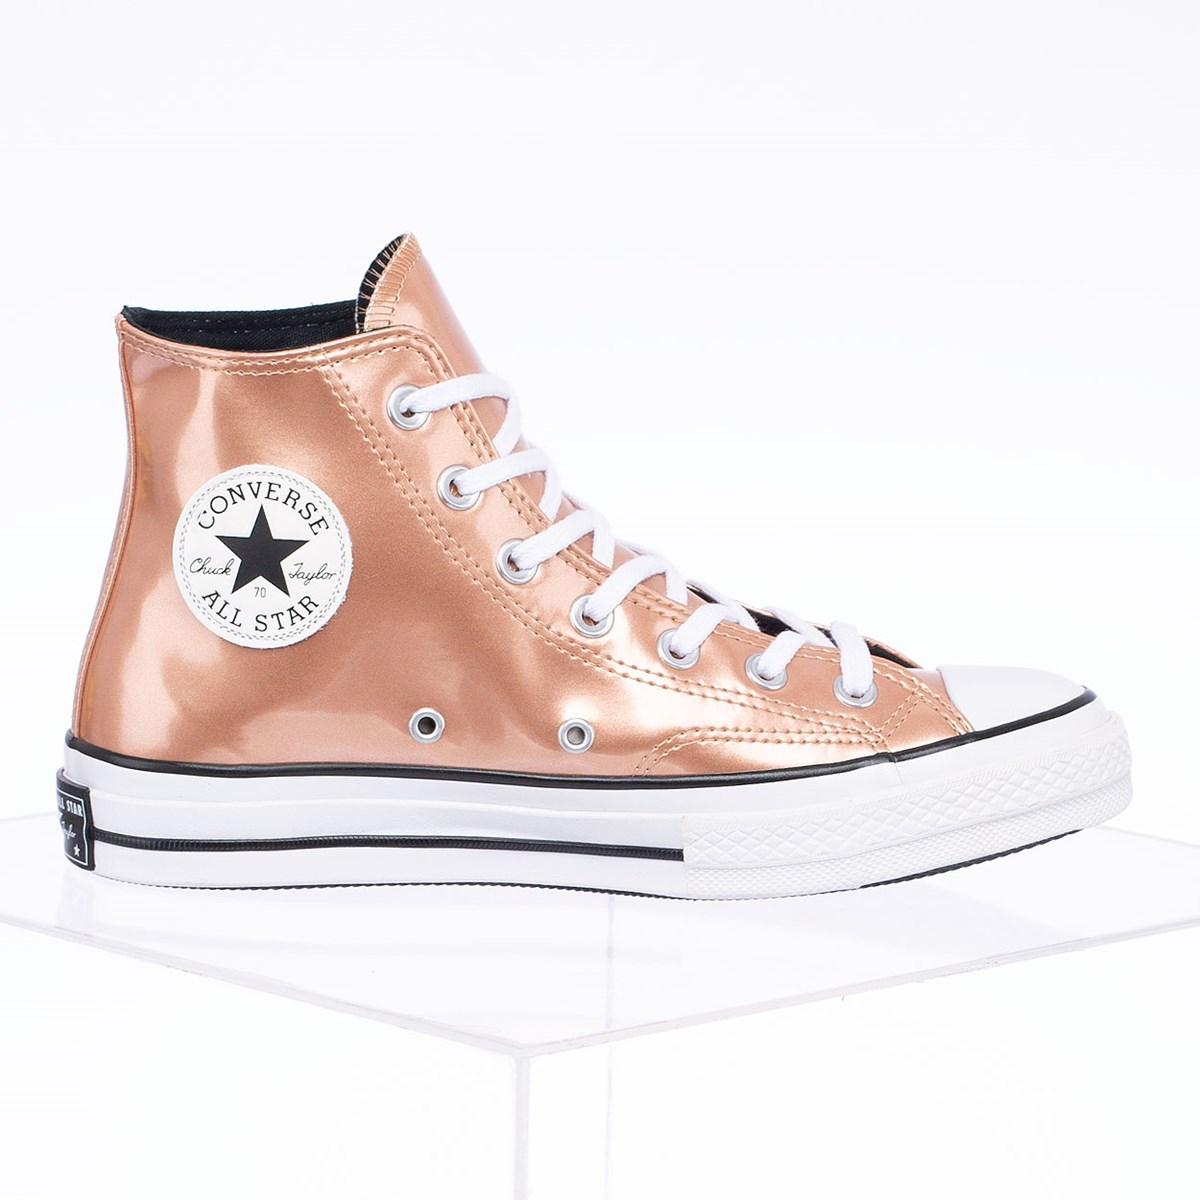 Tênis Converse Chuck 70 Industrial Glam Hi Ouro Escuro CT15010002